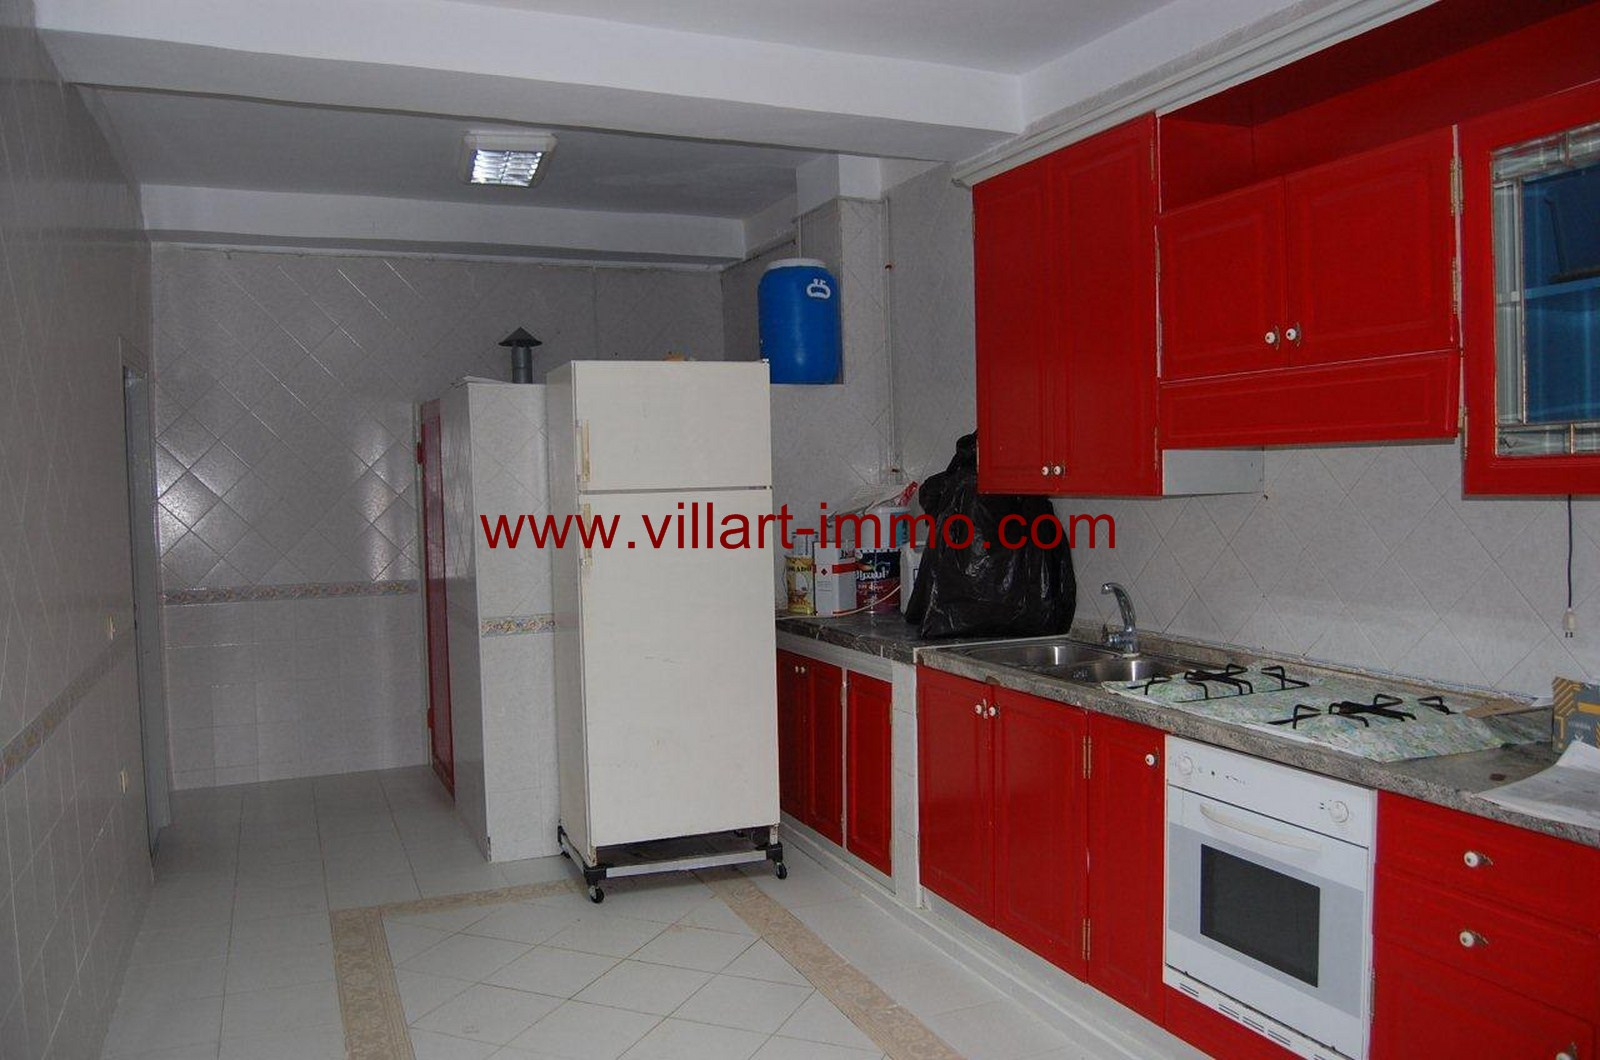 12-Location-Villa-Meublée-Tanger-Achakar-Cuisine-LV910-Villart immo